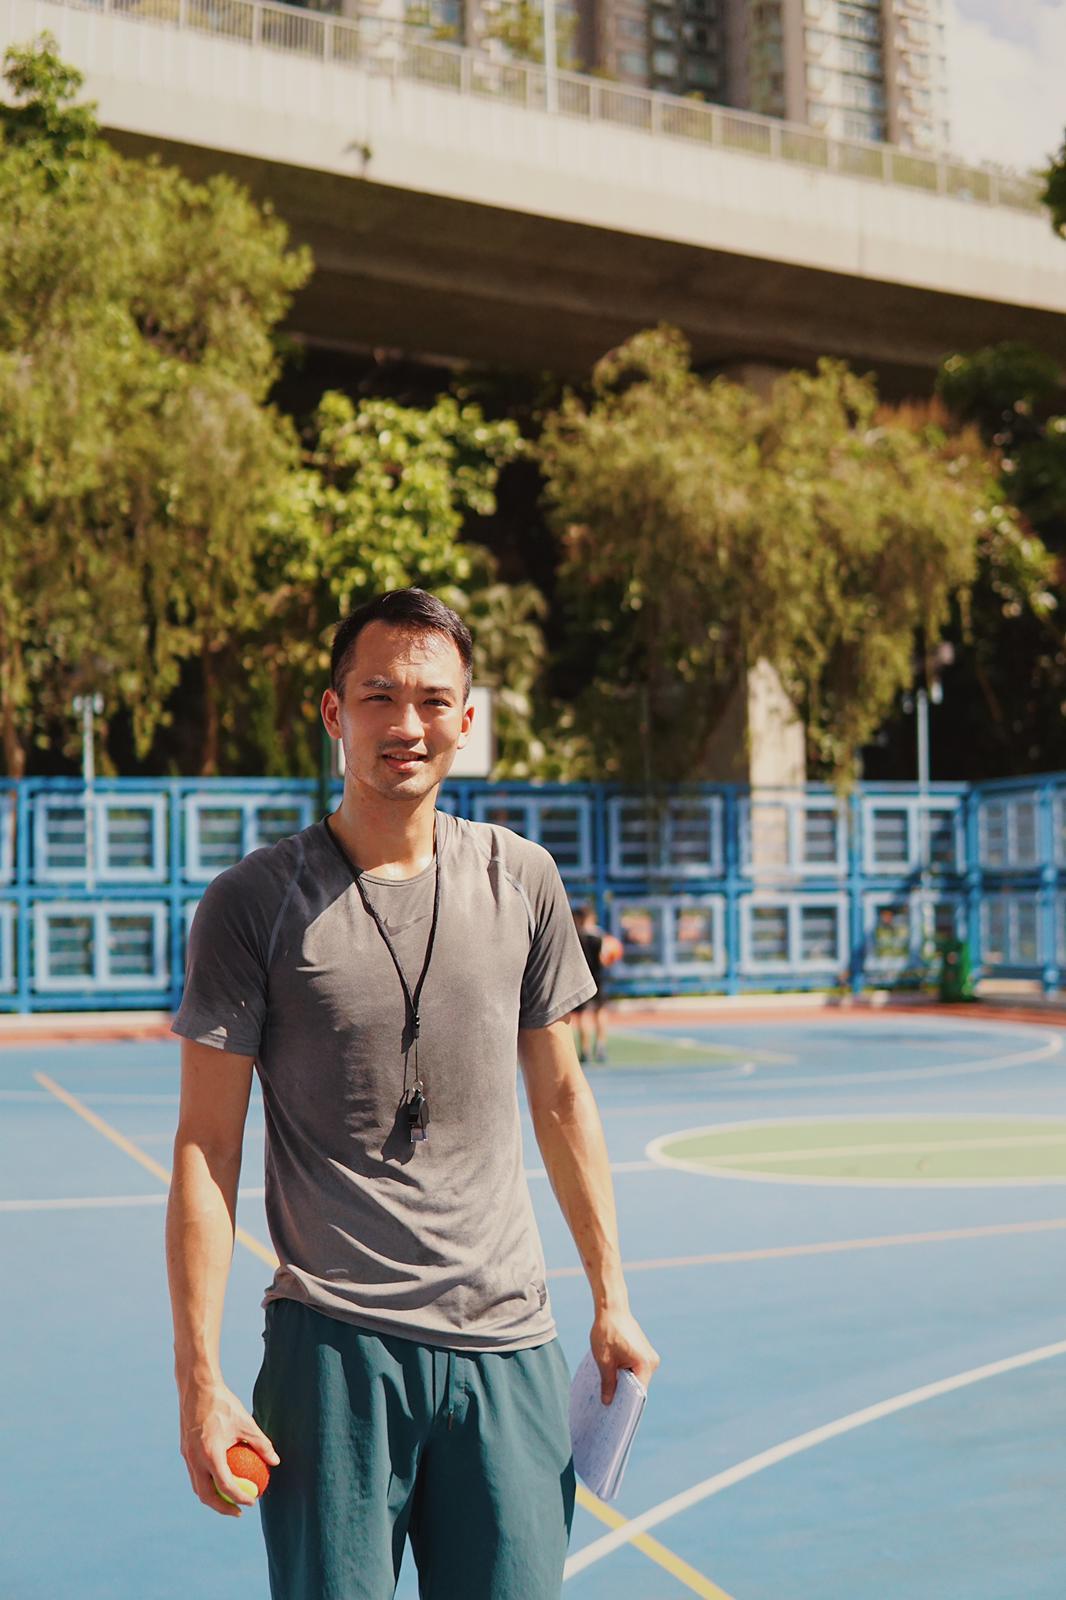 {               en: 'ELV -  Basketball Fundamentals & HIIT Fitness',               cn: 'ELV - 籃球基礎和HIIT體育課程'             } 1